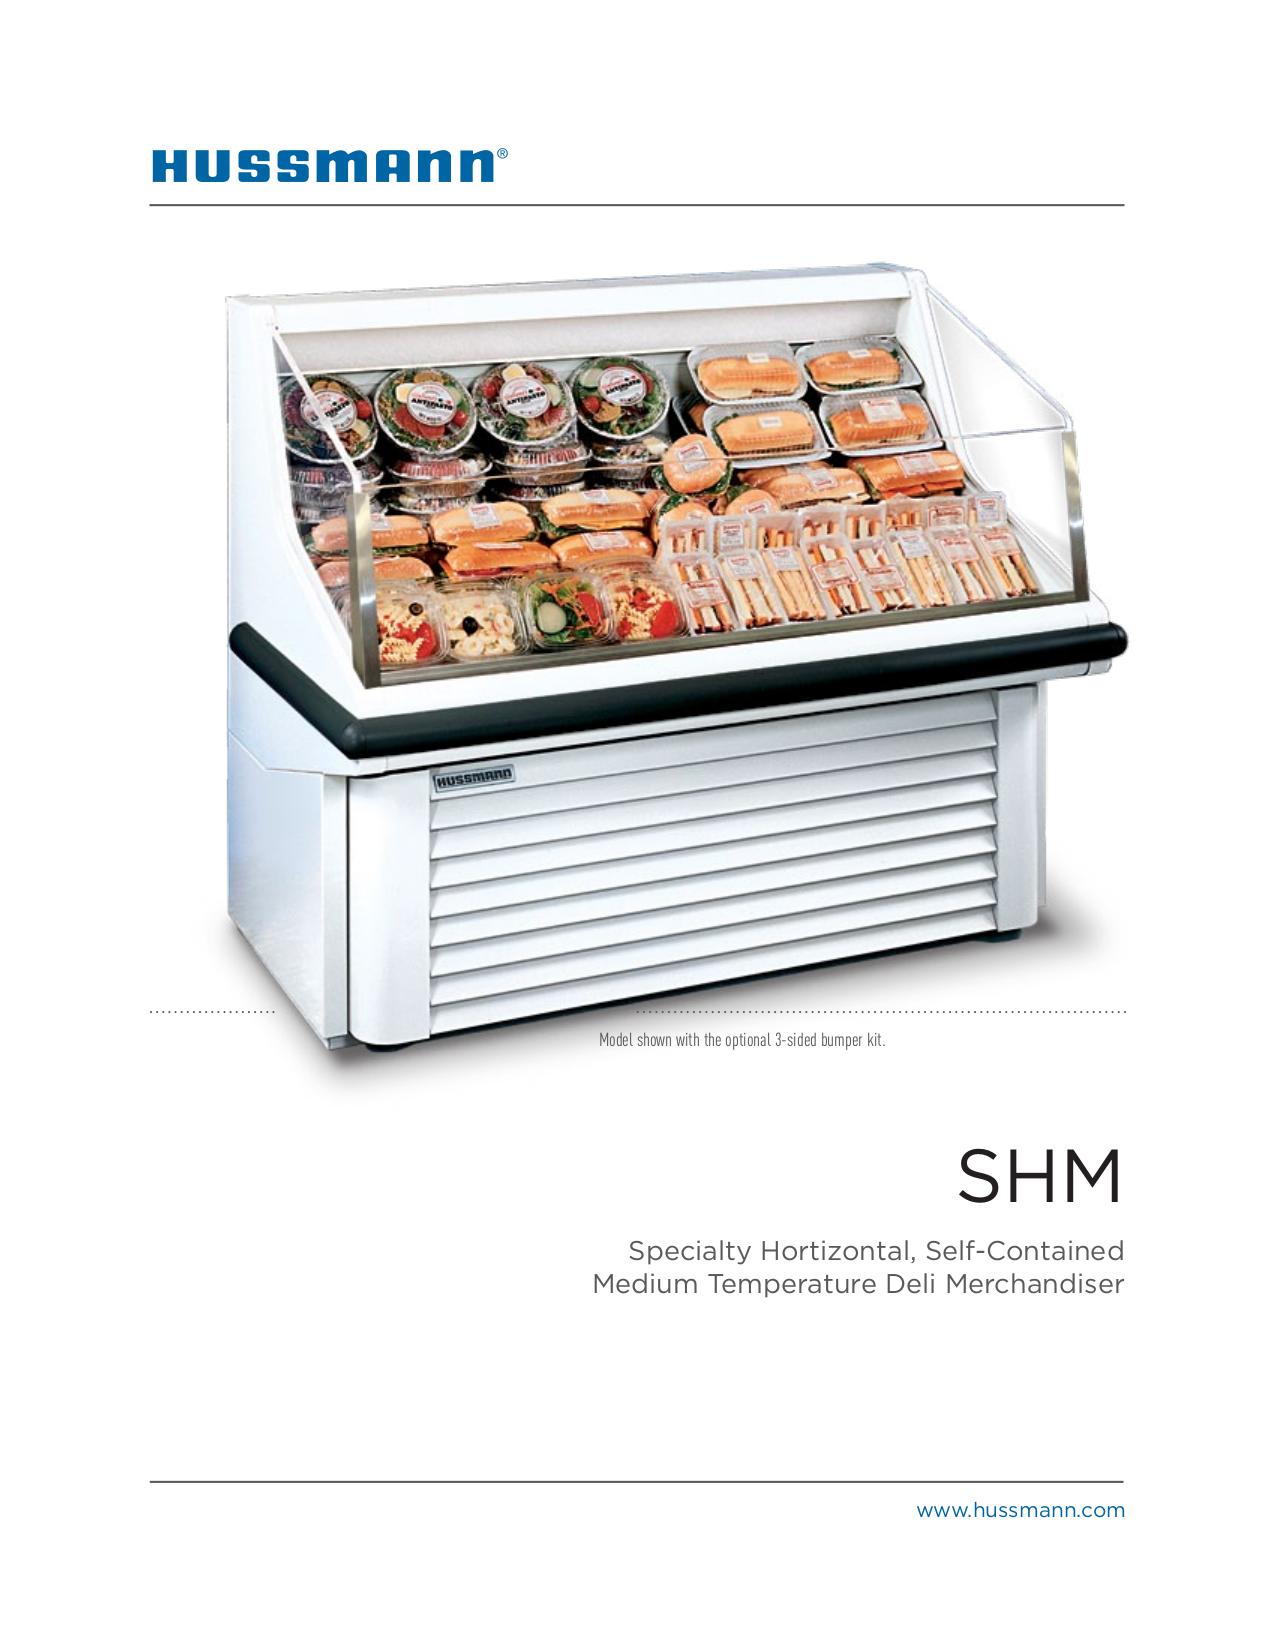 Hussmann Shm 3 M J Mac Inc